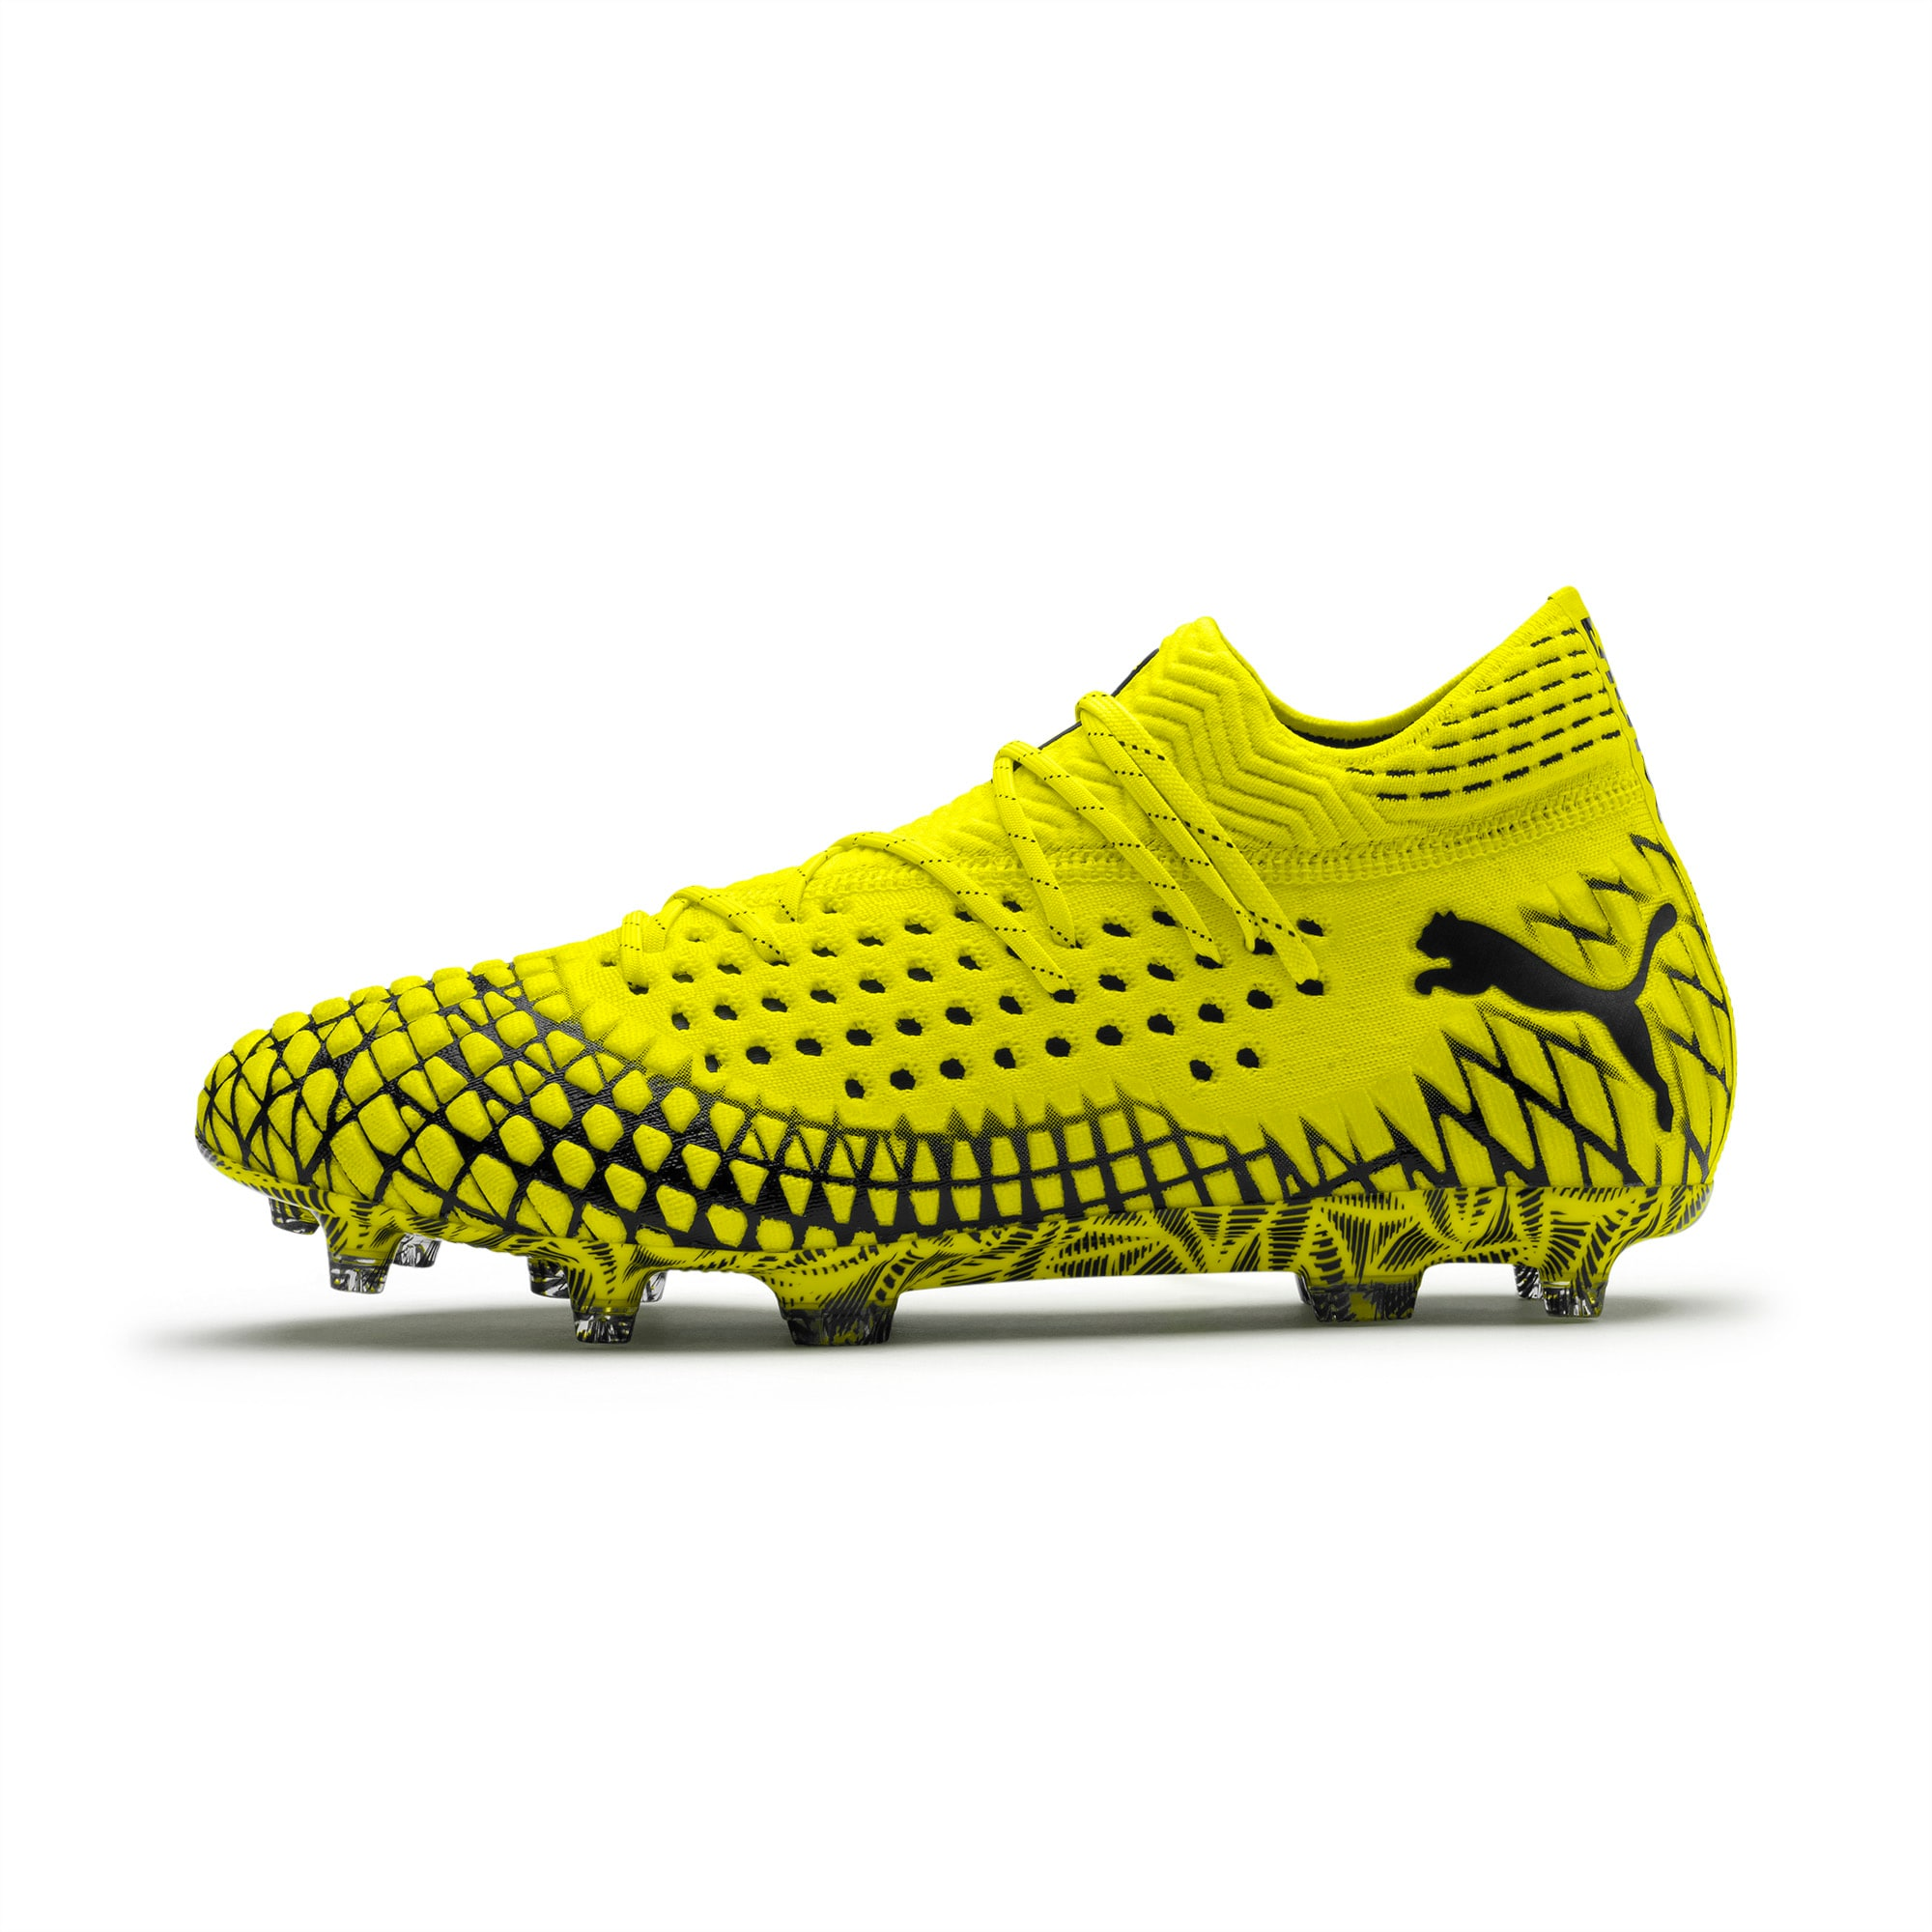 PUMA Mens Shoes: Football Turf Training | PUMA Future, One